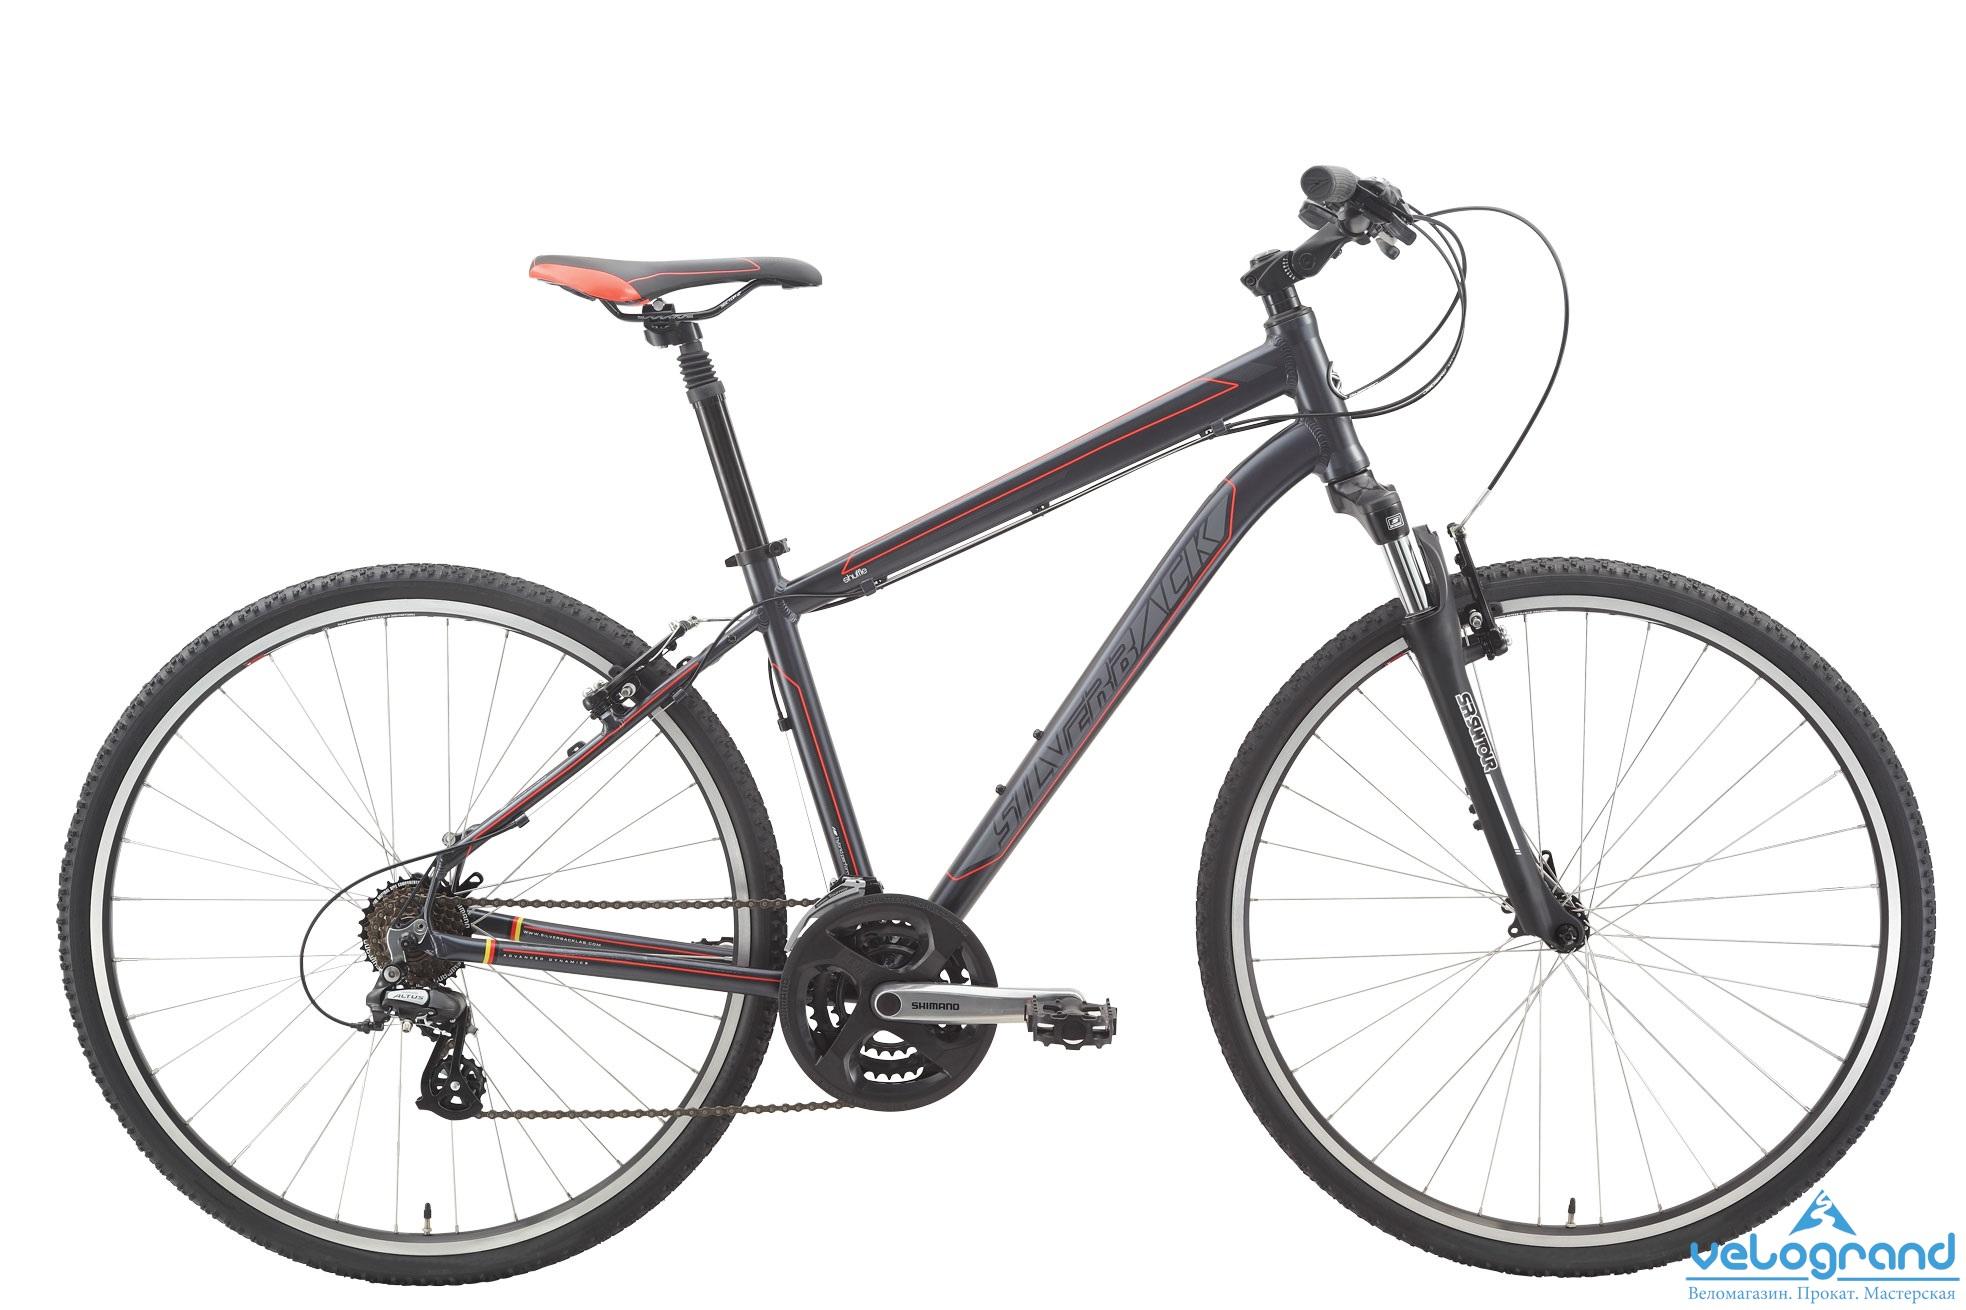 Городской велосипед Silverback Shuffle Sport (2015), Цвет Серый, Размер 15